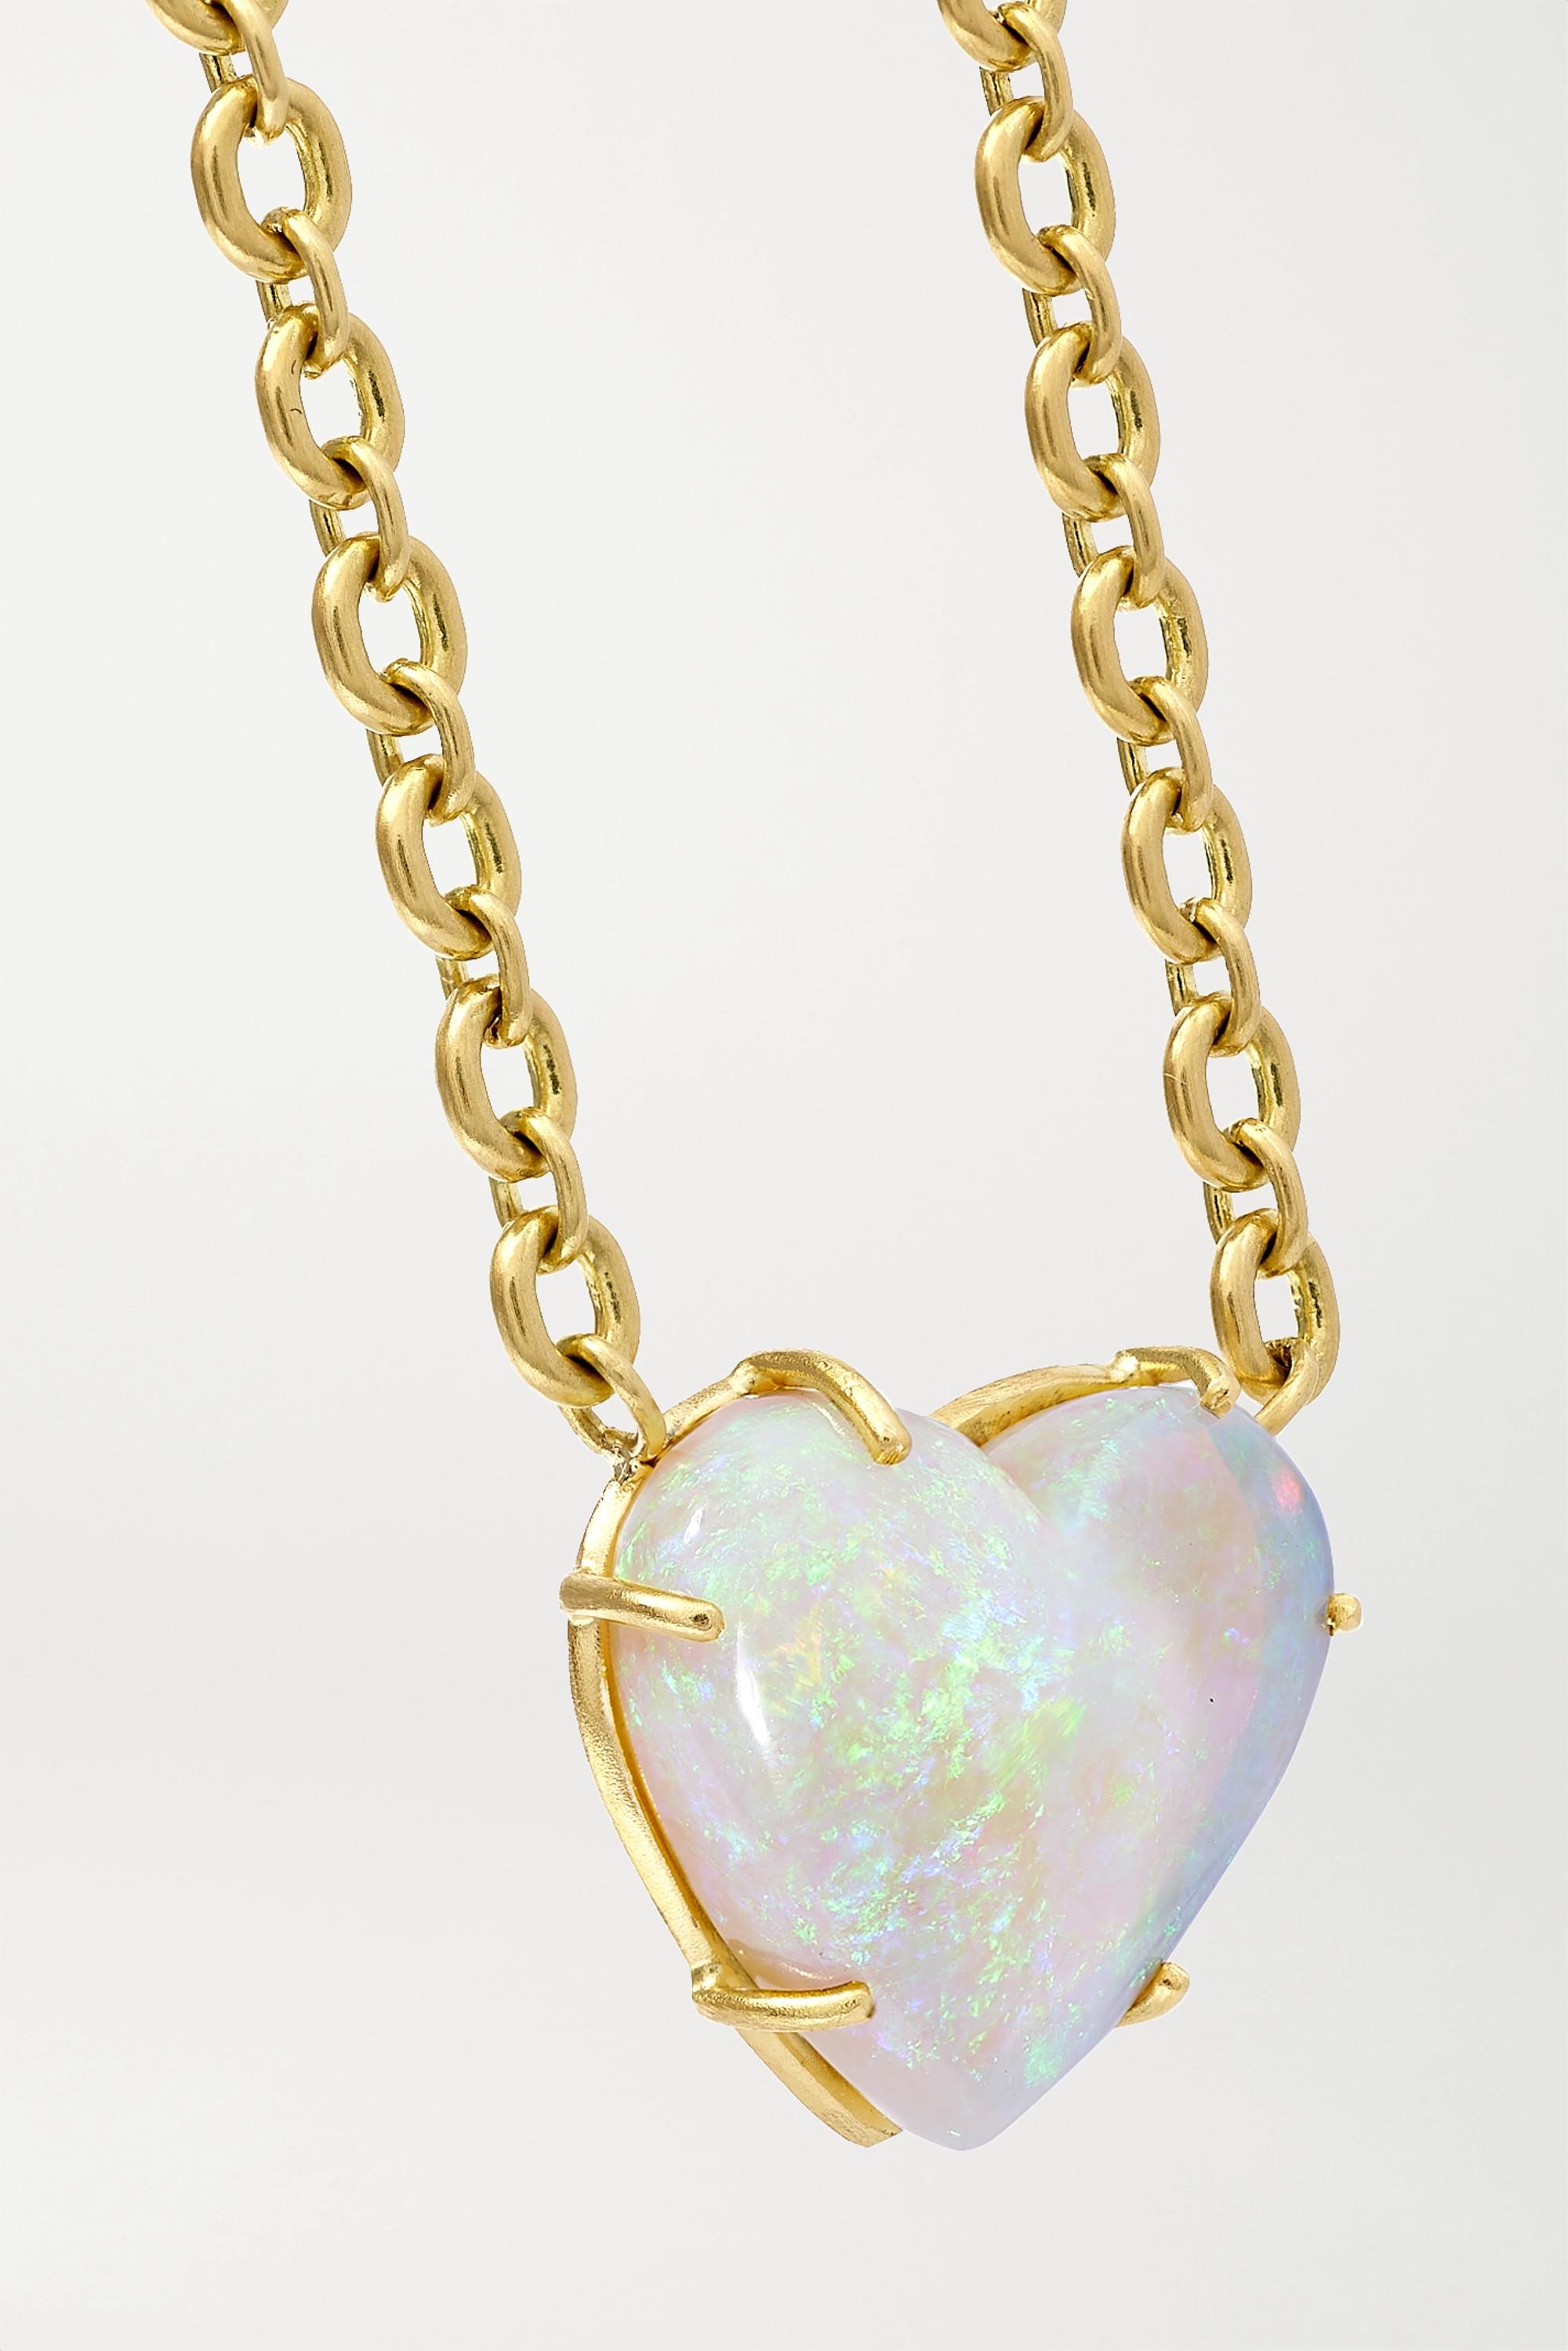 Irene Neuwirth Collier en or 18 carats et opale Love